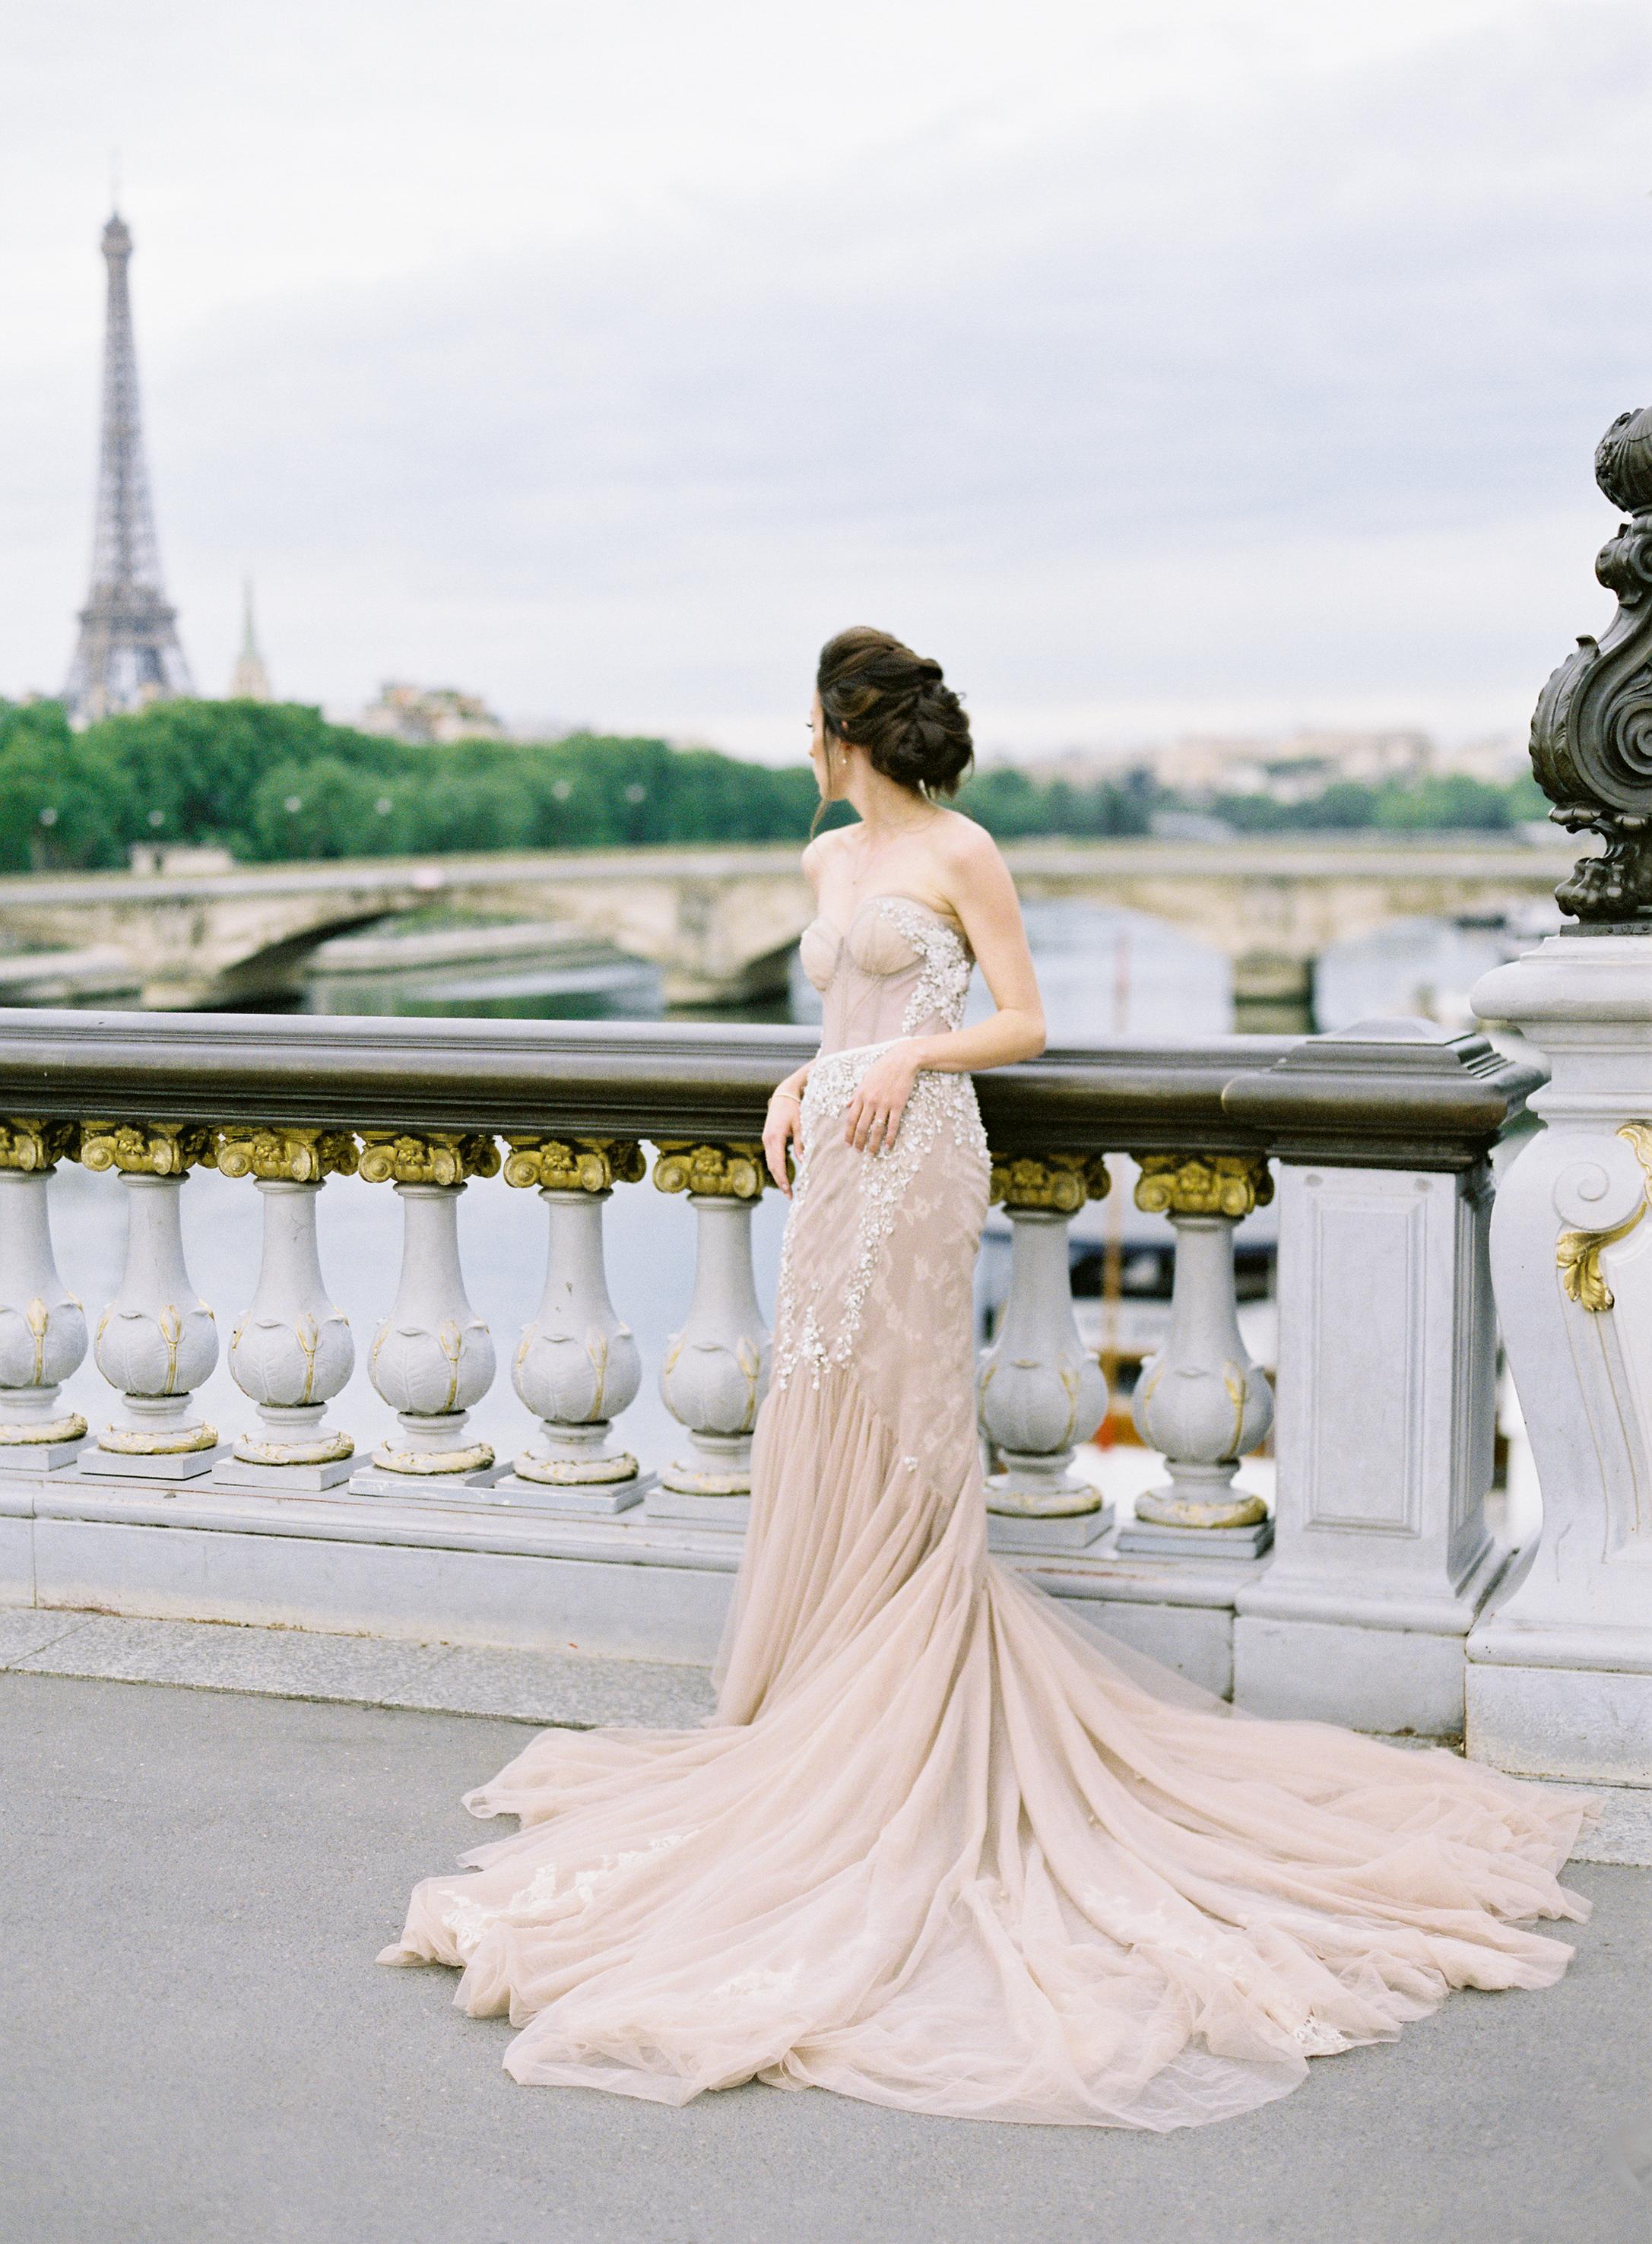 Paris-France-Film-Wedding-Carrie King Photographer-113.jpg